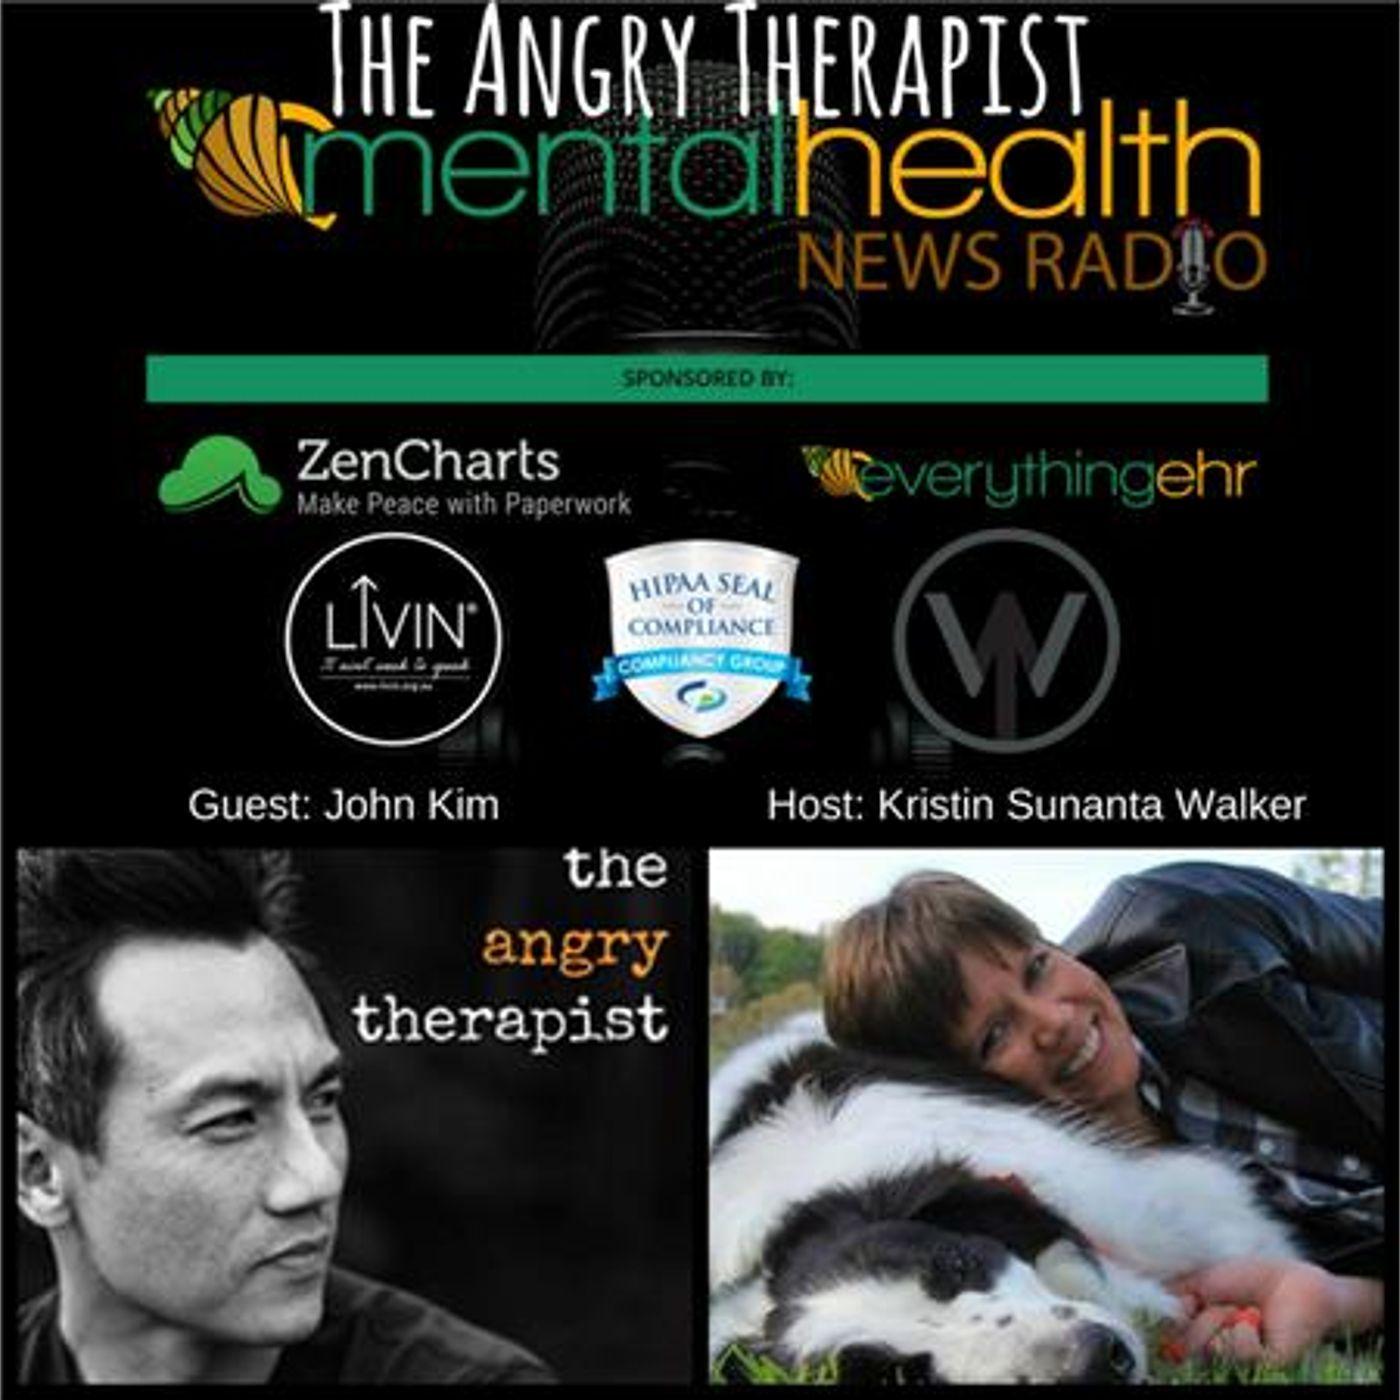 Mental Health News Radio - The Angry Therapist: John Kim on Mental Health News Radio